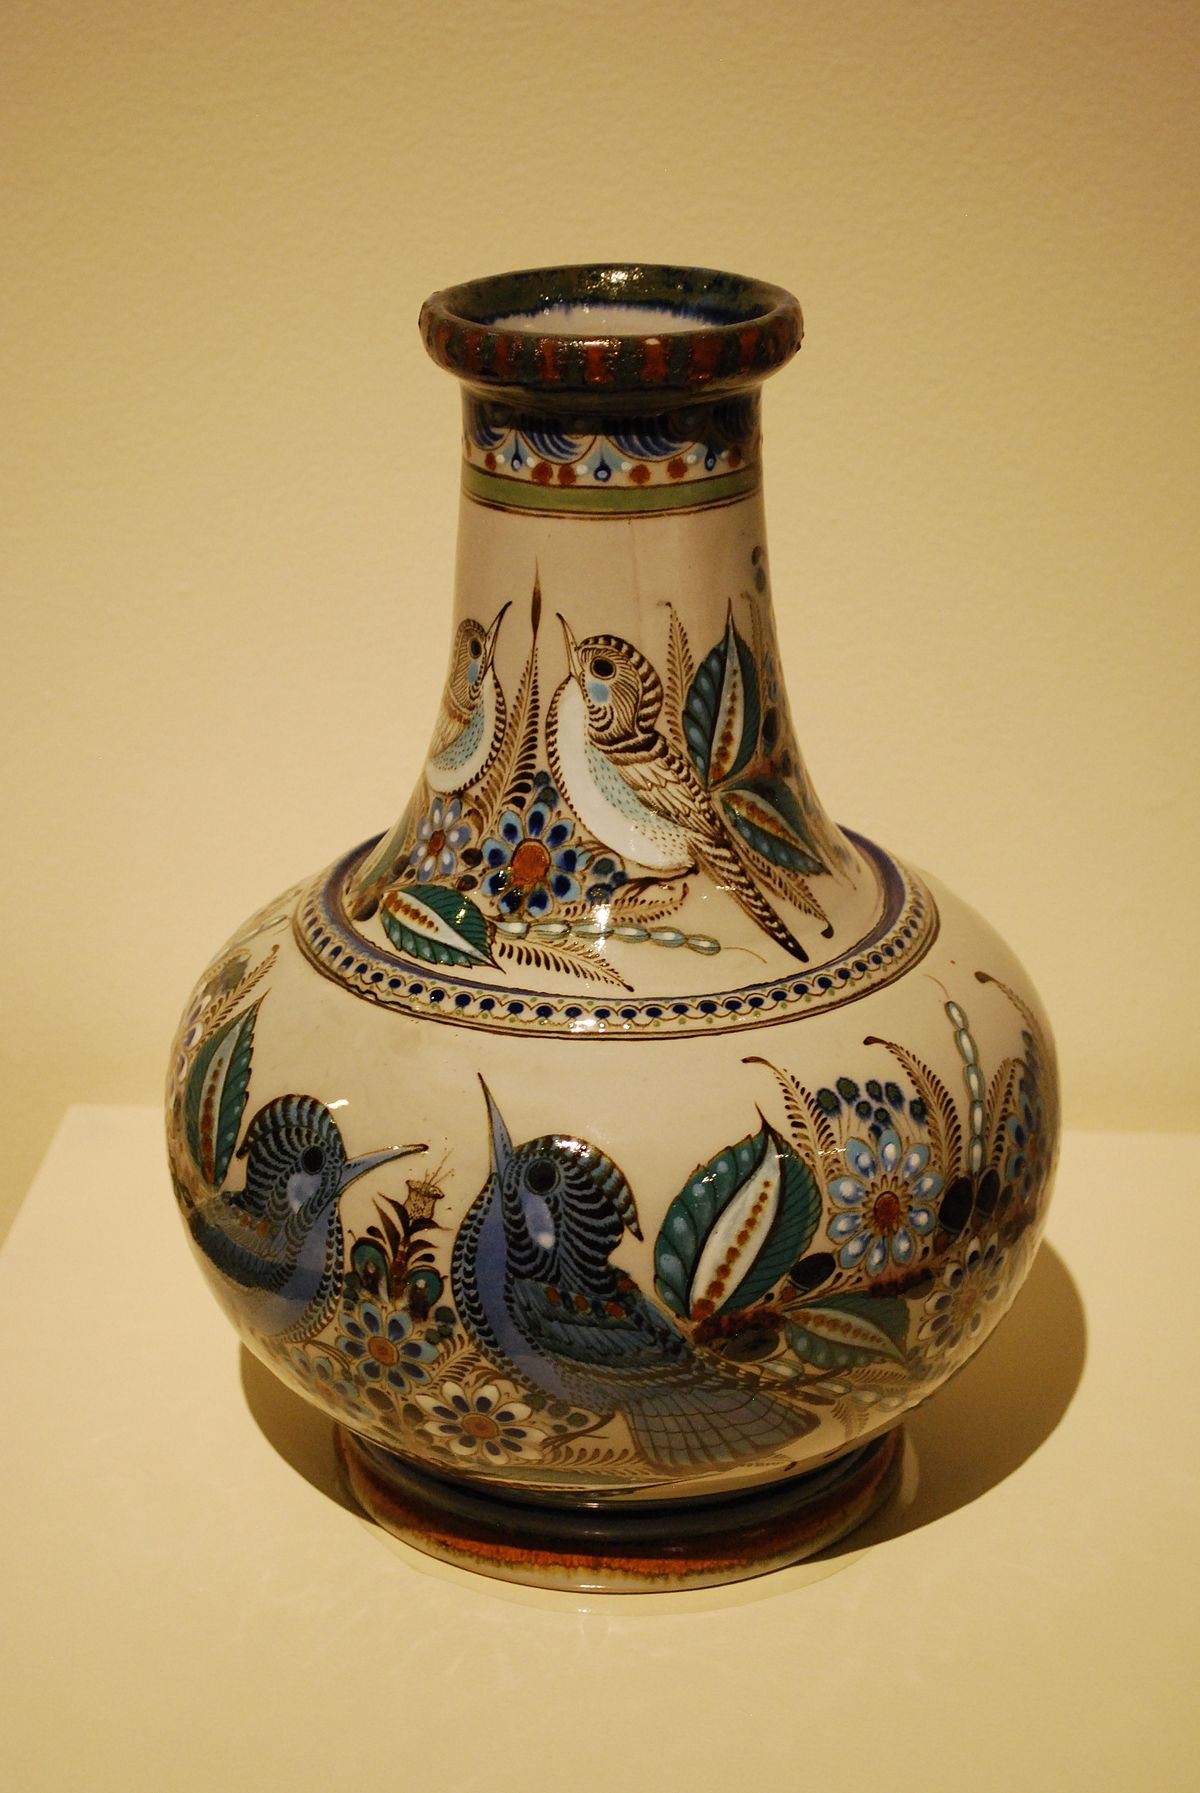 Florero objeto wikipedia la enciclopedia libre - Fotos de ceramica ...